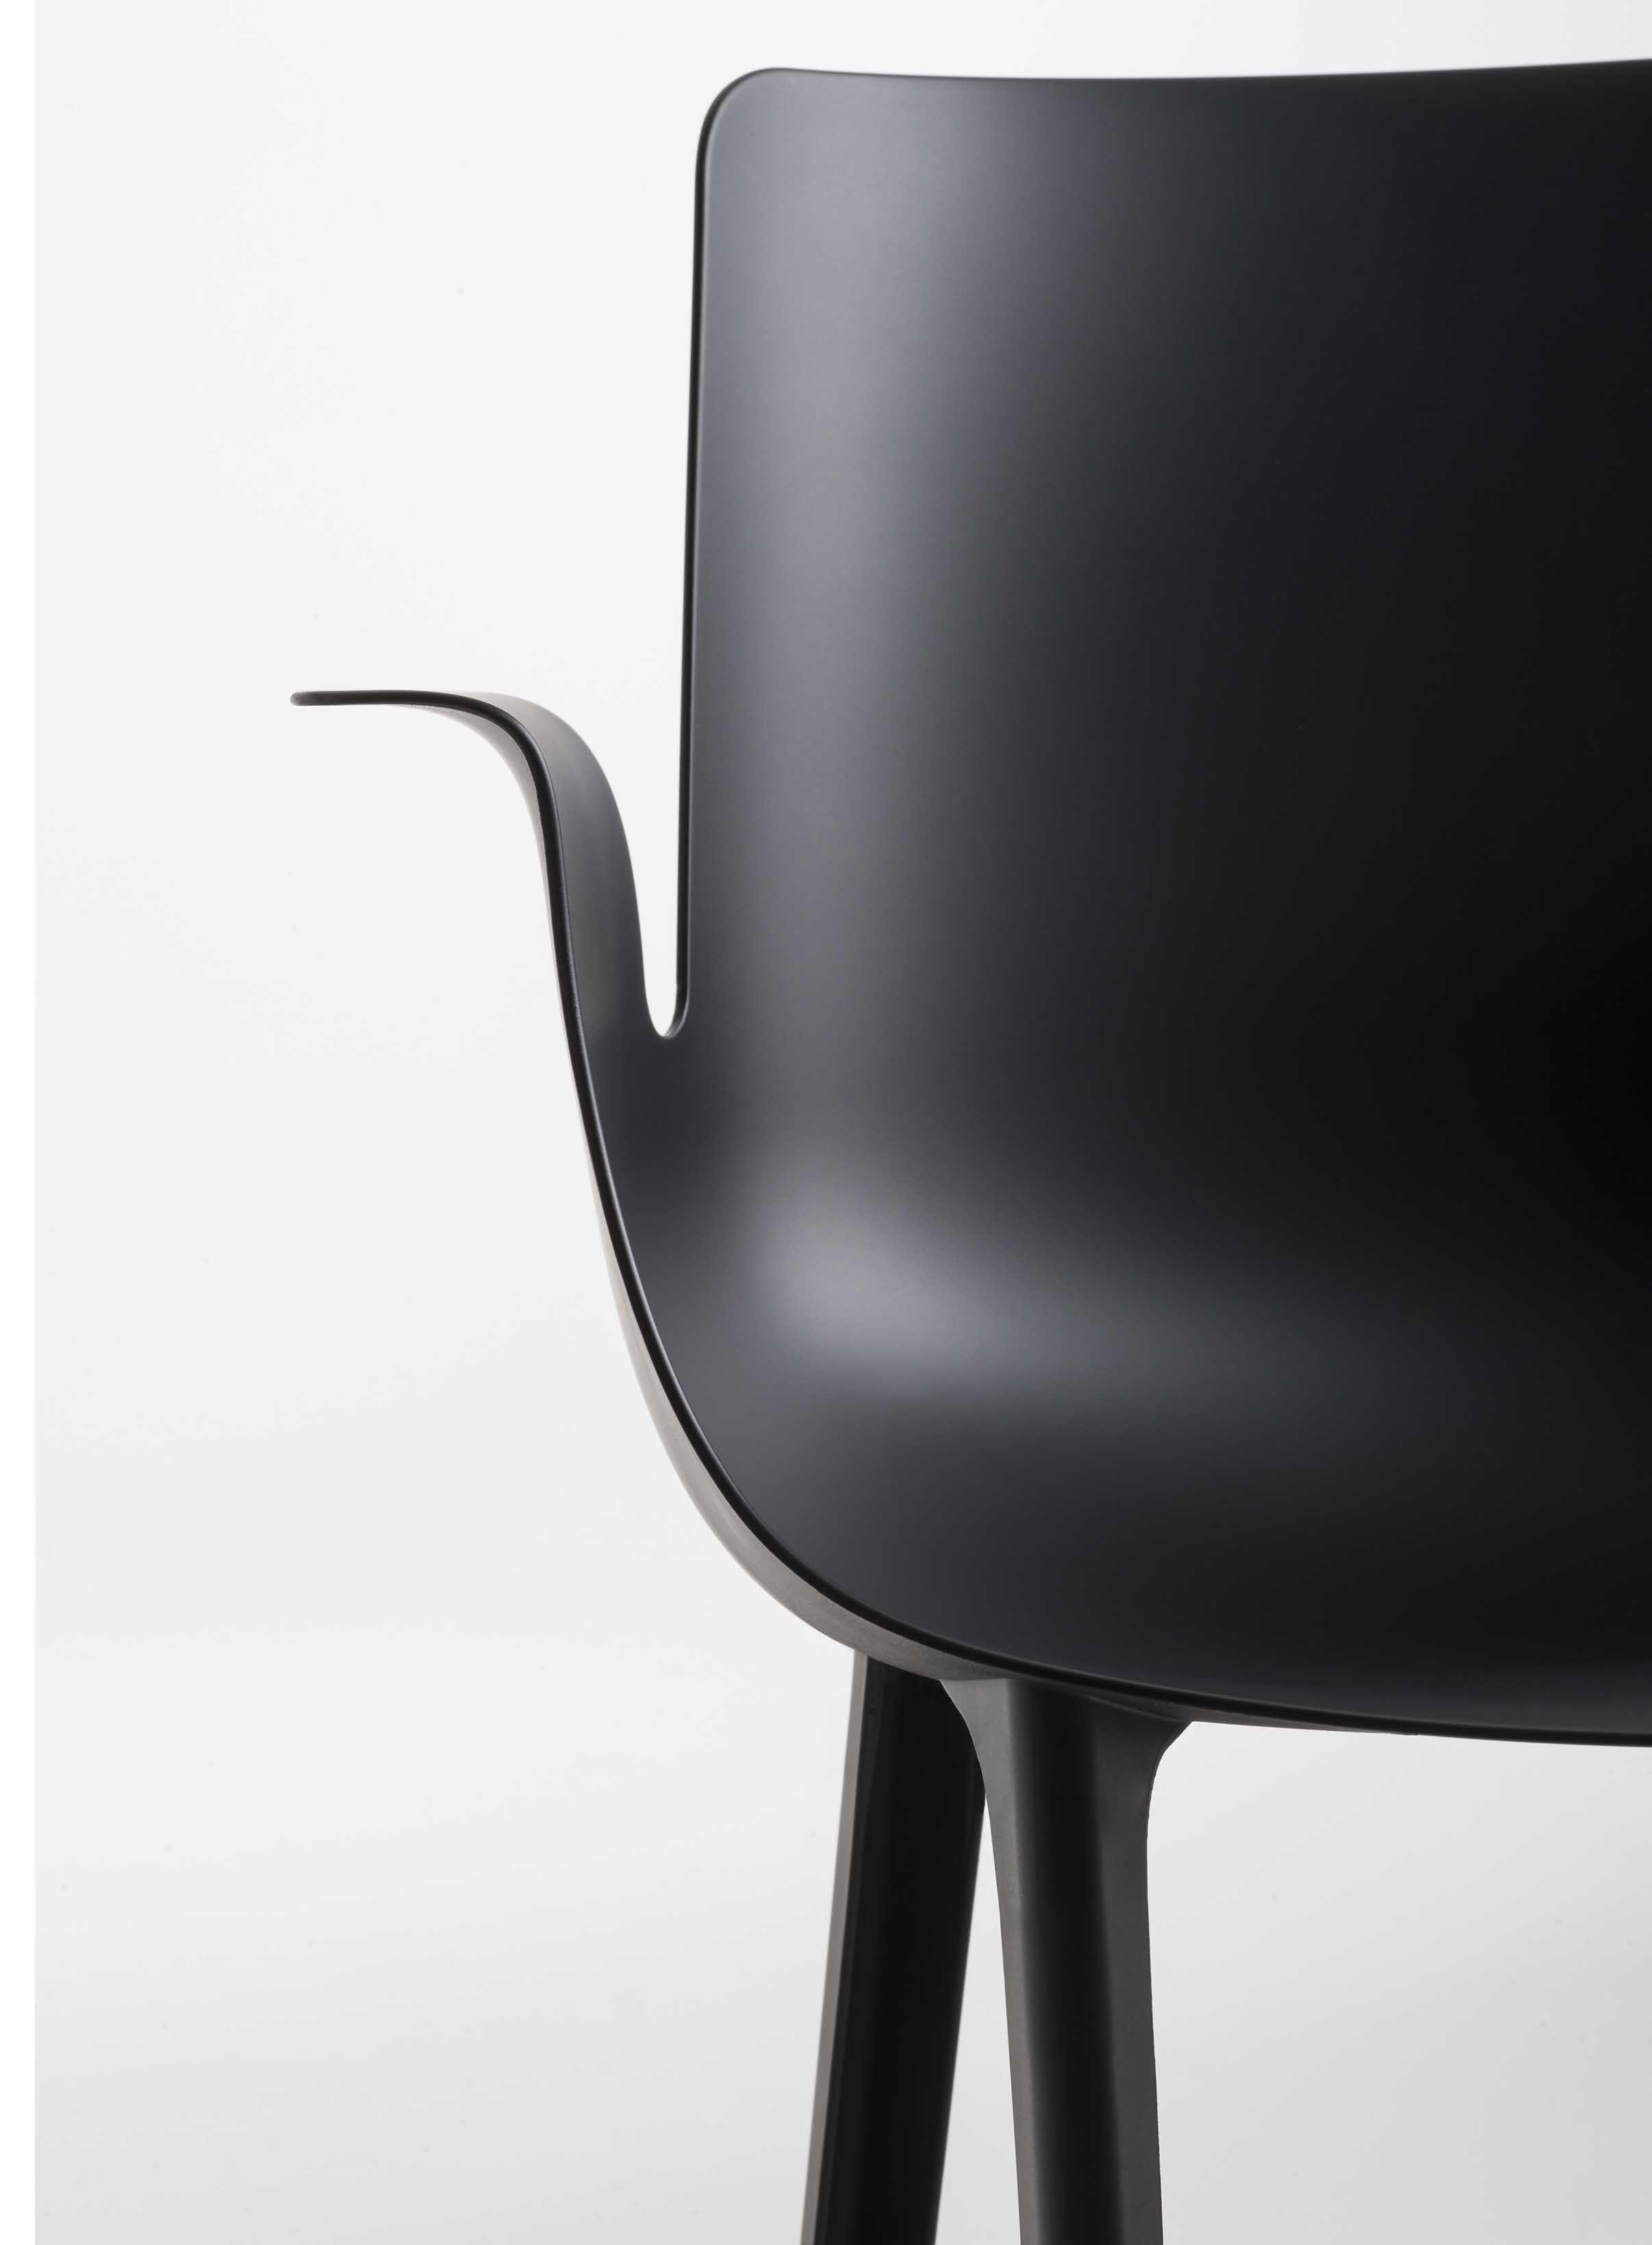 Piuma By Piero Lissoni For Kartell Furniture Design Chair Furniture Design Chair Design